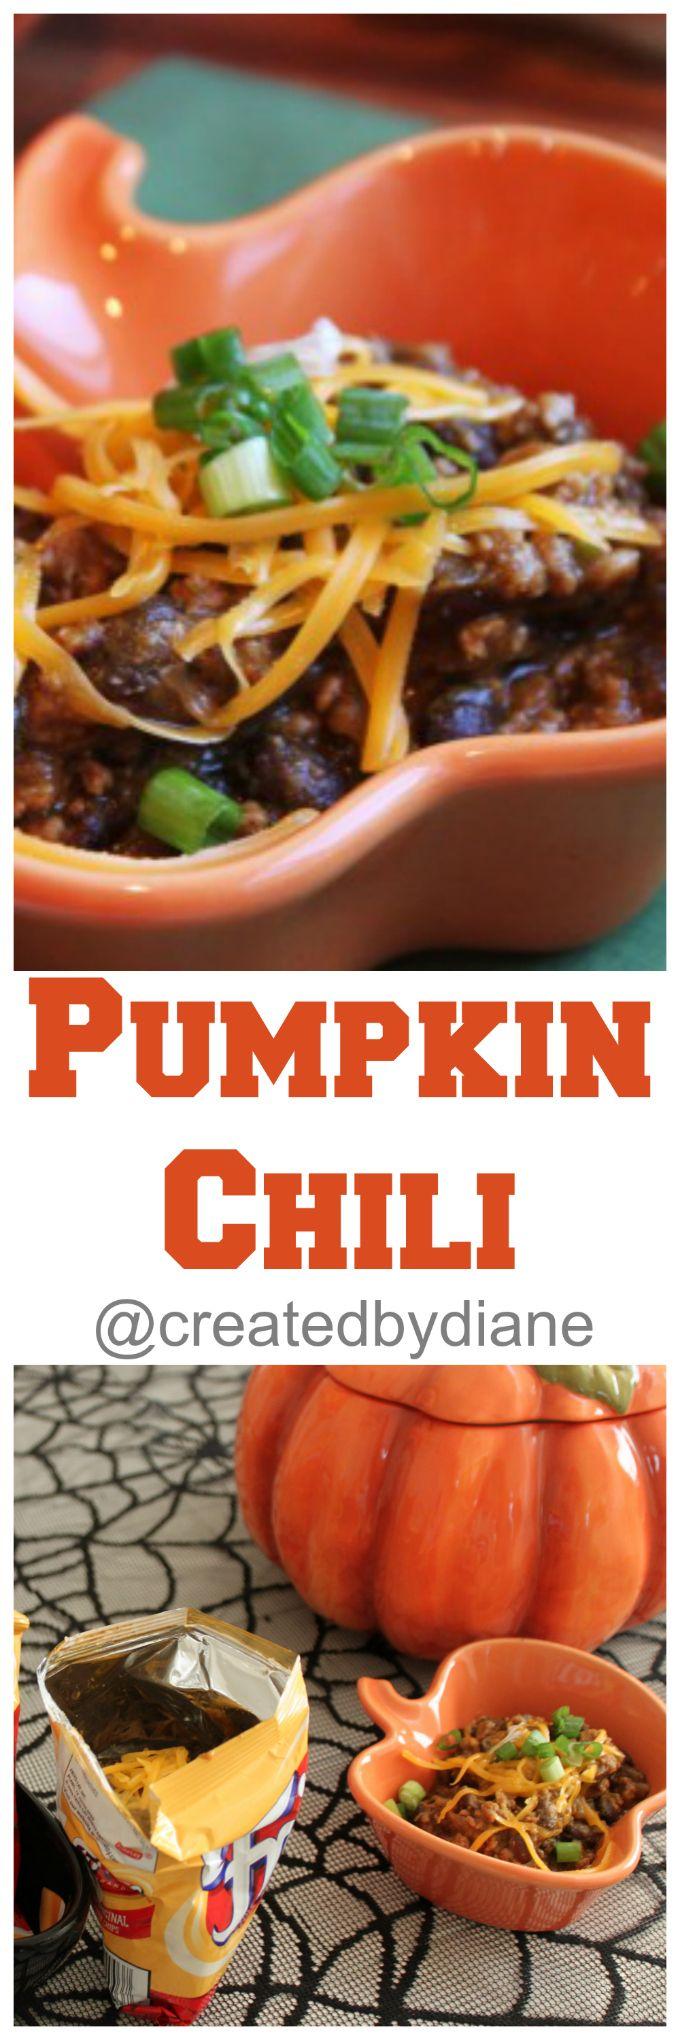 pumpkin-chili-recipe-from-www-createdby-diane-com-createdbydiane